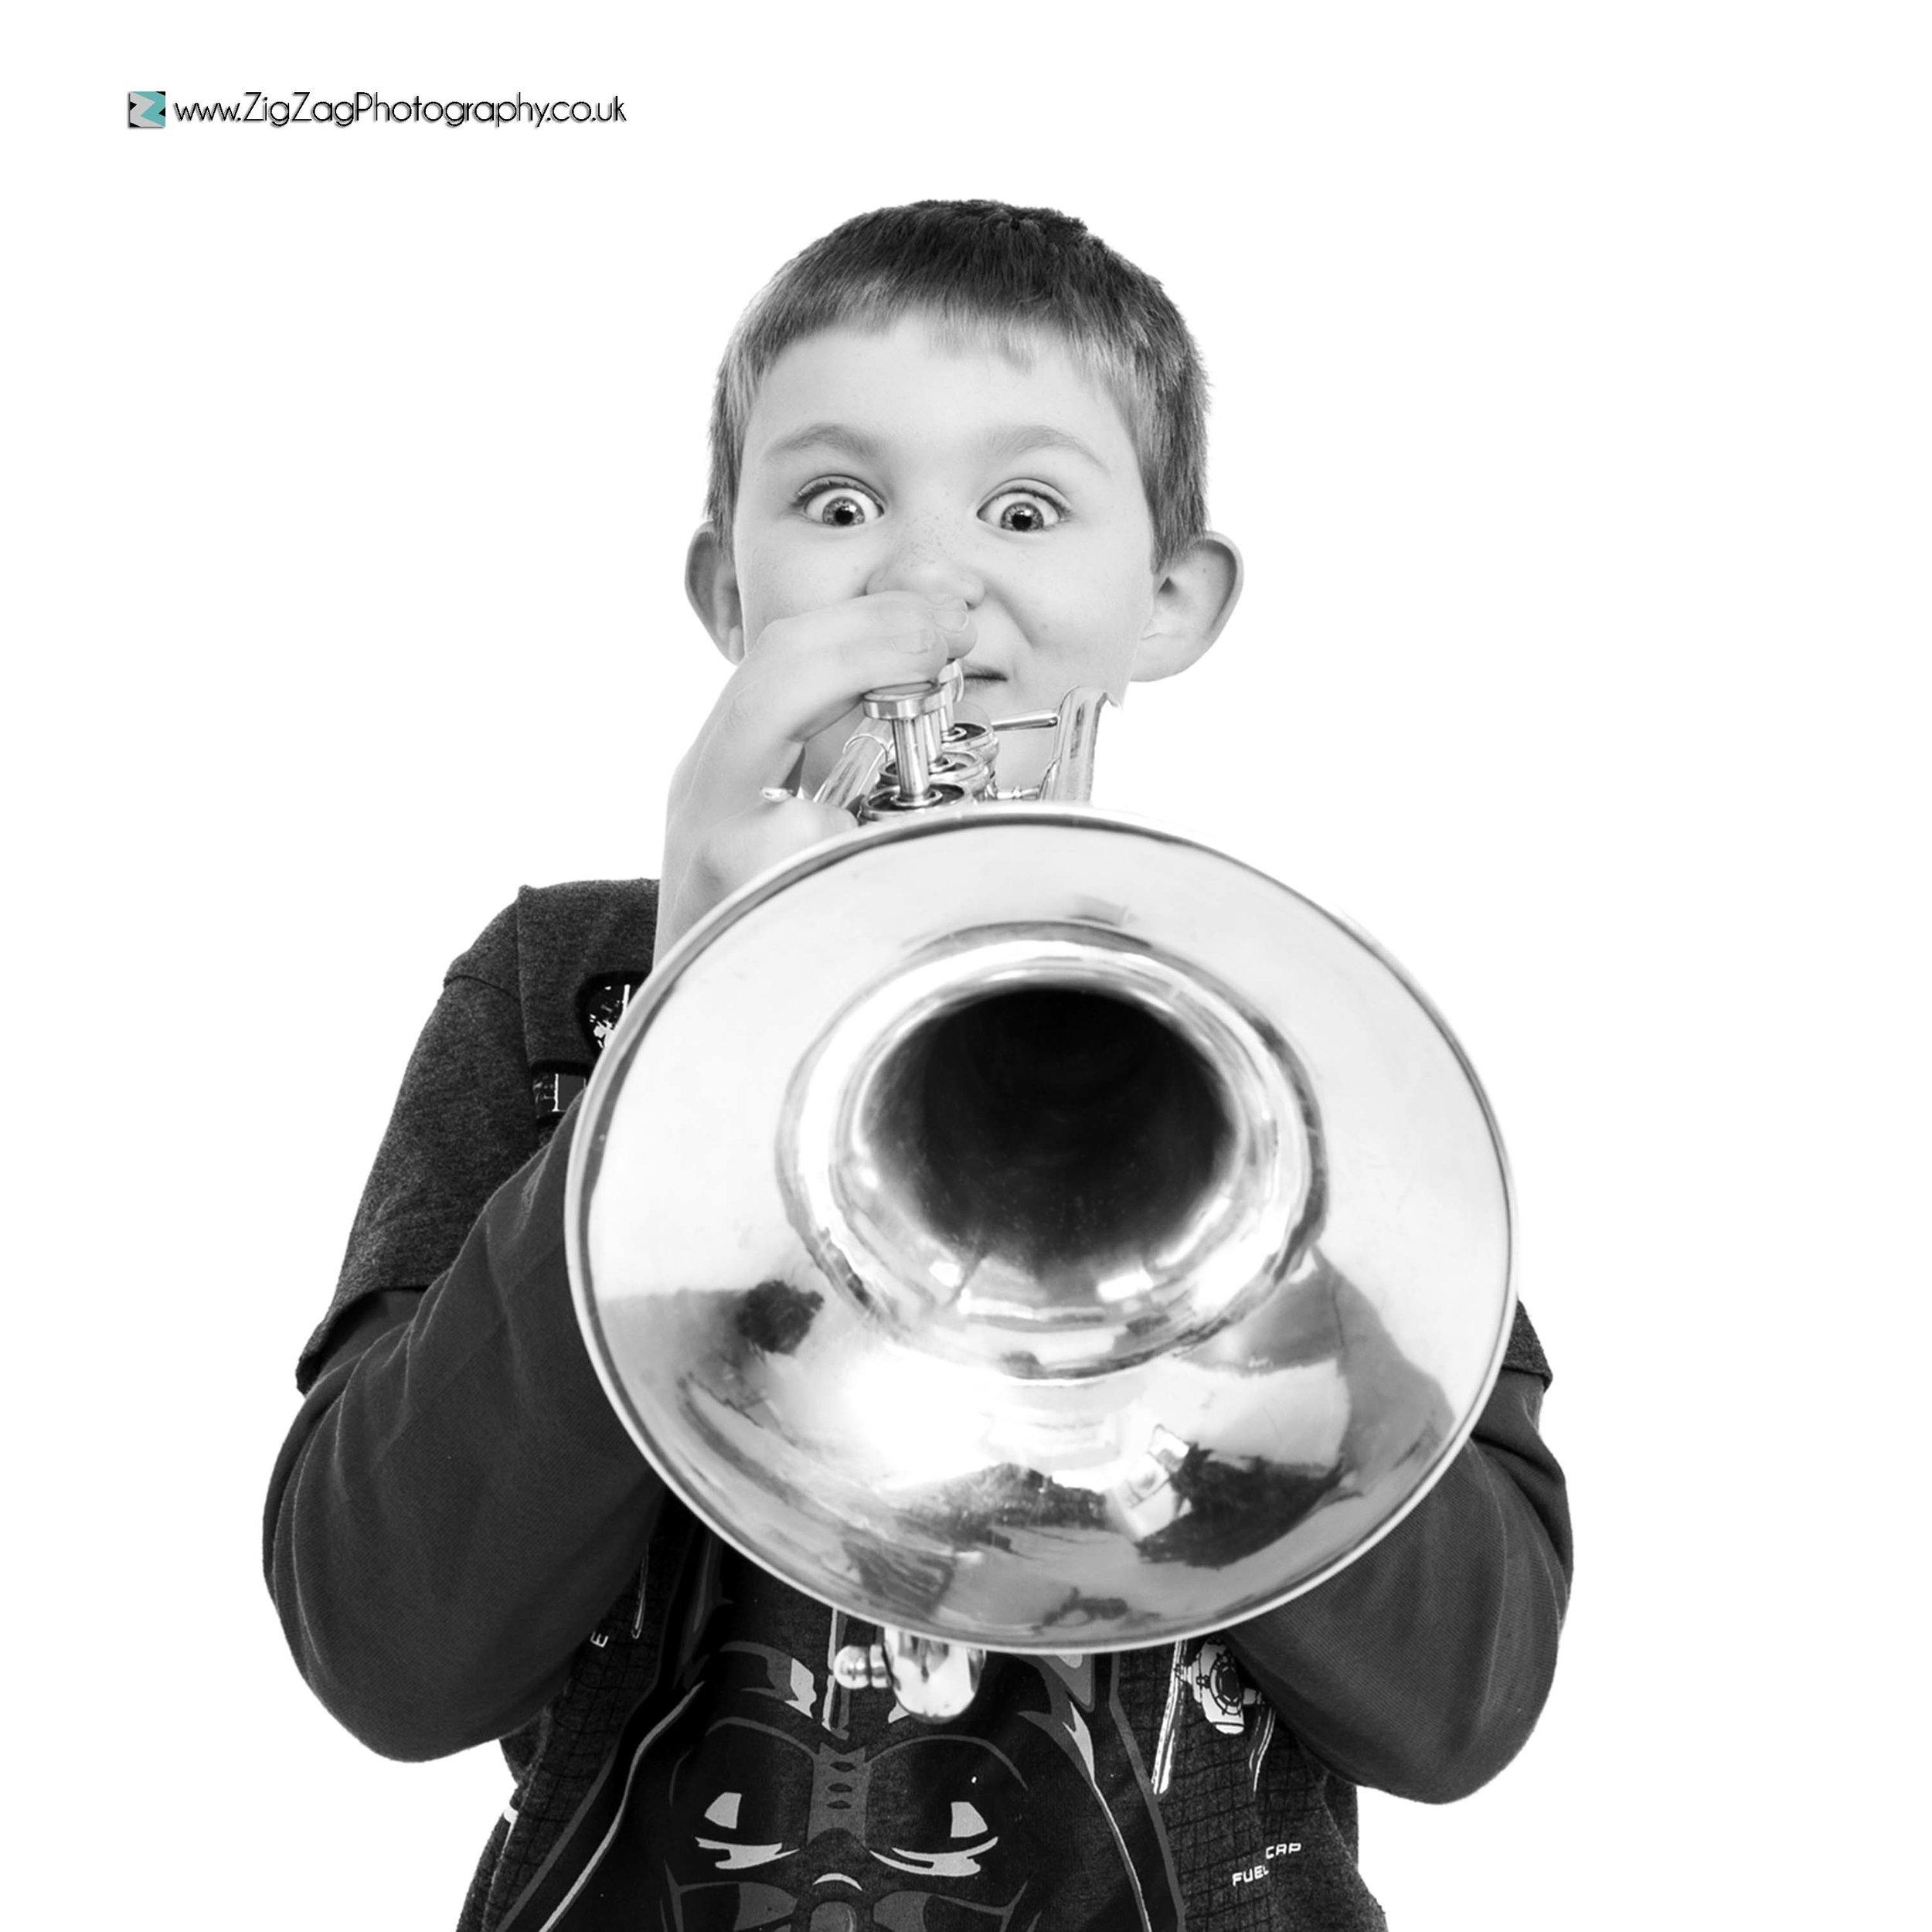 photography-studio-leicester-photoshoot-intrument-brass-trumpet-black-white-props-ideas-hobbies-boy-children.jpg